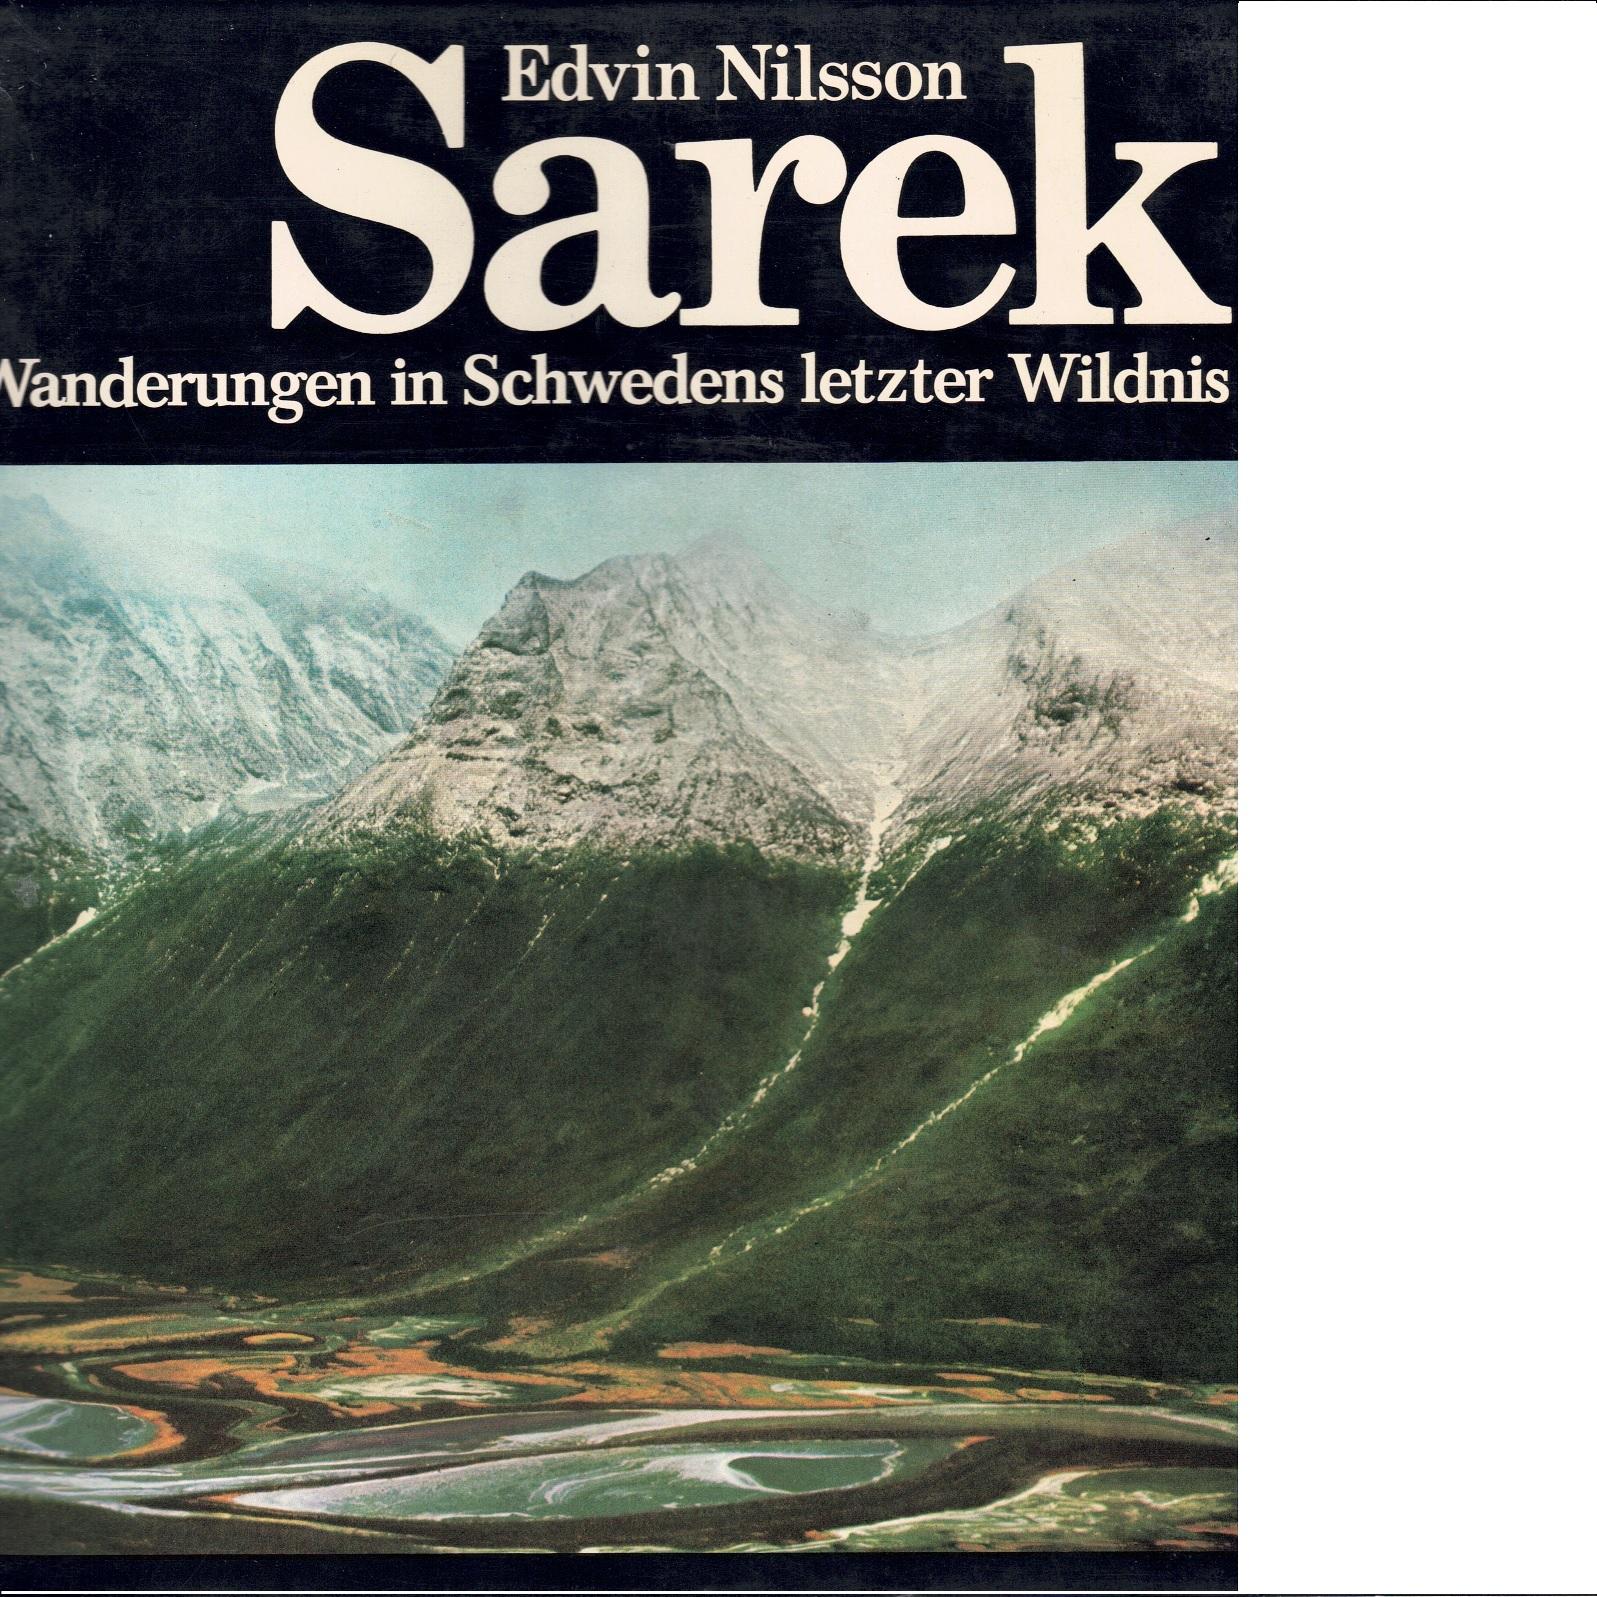 Sarek : Wanderungen in Schwedens letzter Wildnis - Nilsson, Edvin